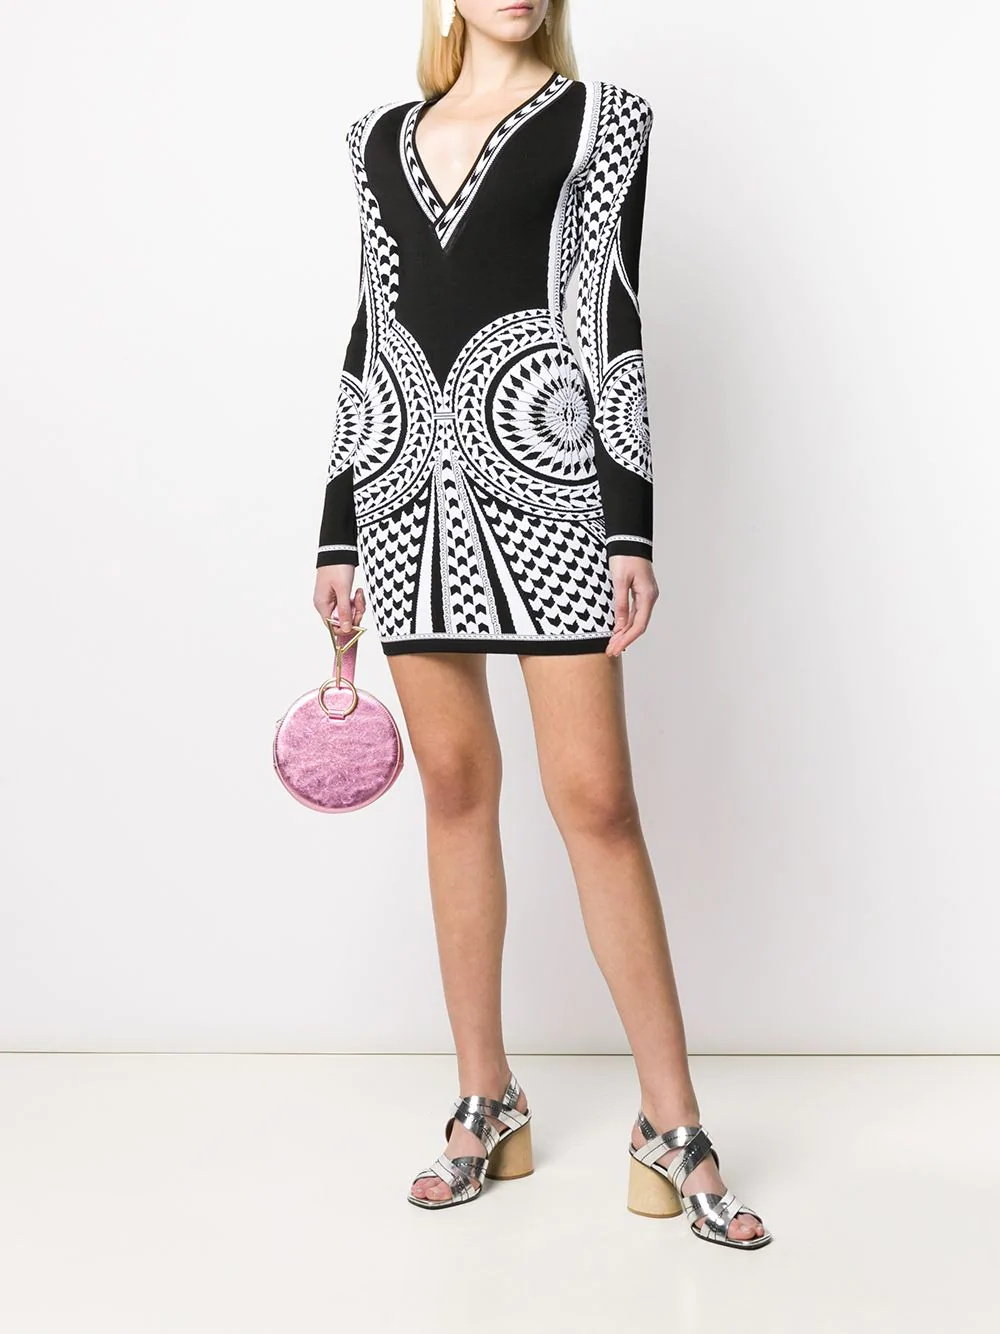 High Quality Black Long Sleeve Jacquard Rayon Bandage Dress Elegant Evening Party Dress